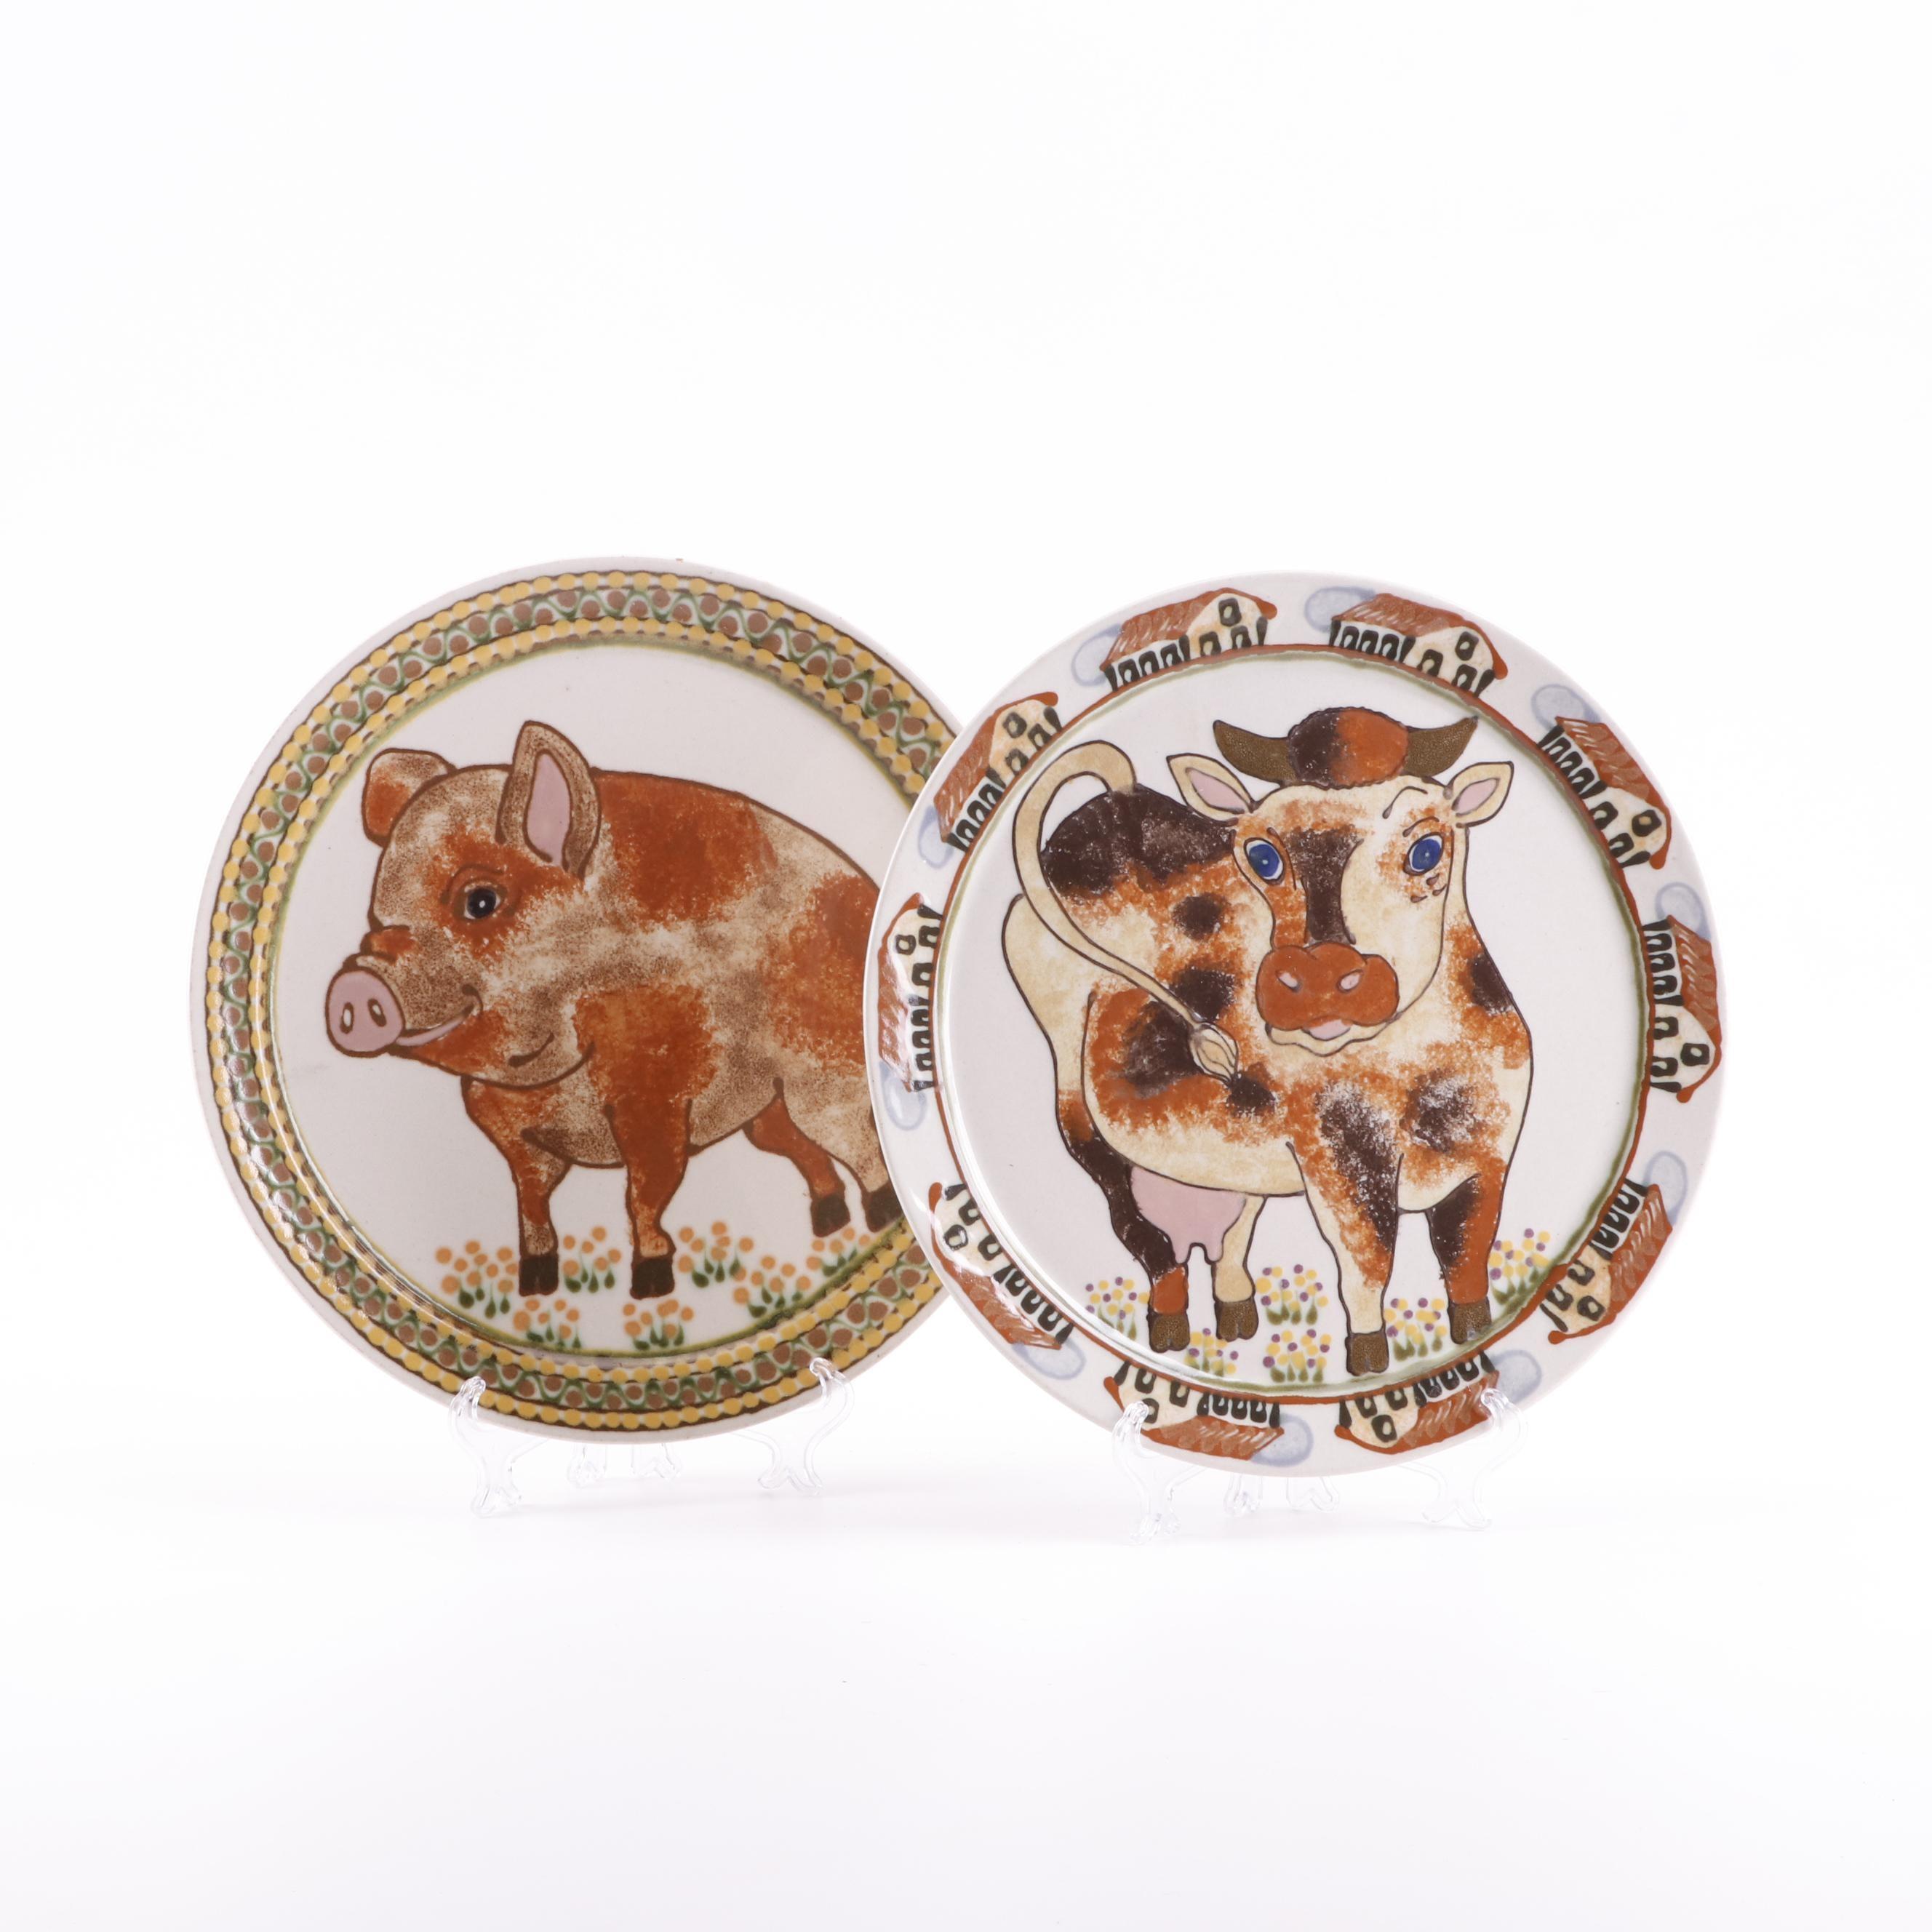 Janet Rothwoman Hand-Painted Barnyard Animal Stoneware Plates